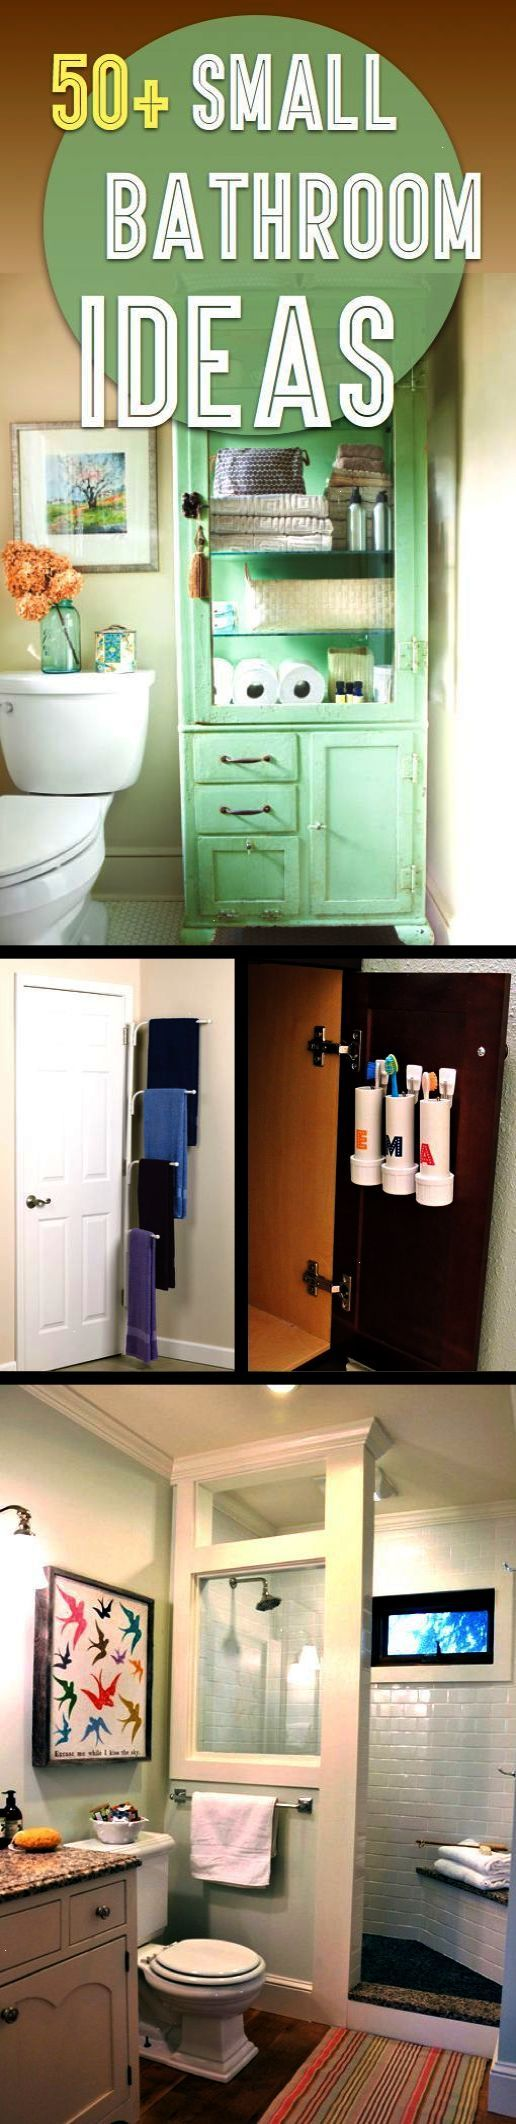 Look What I Pinned Nautical Bathroom Decor Walmart Super Home Diy Storage Spaces Small Bathroom Nautical bathroom decor walmart